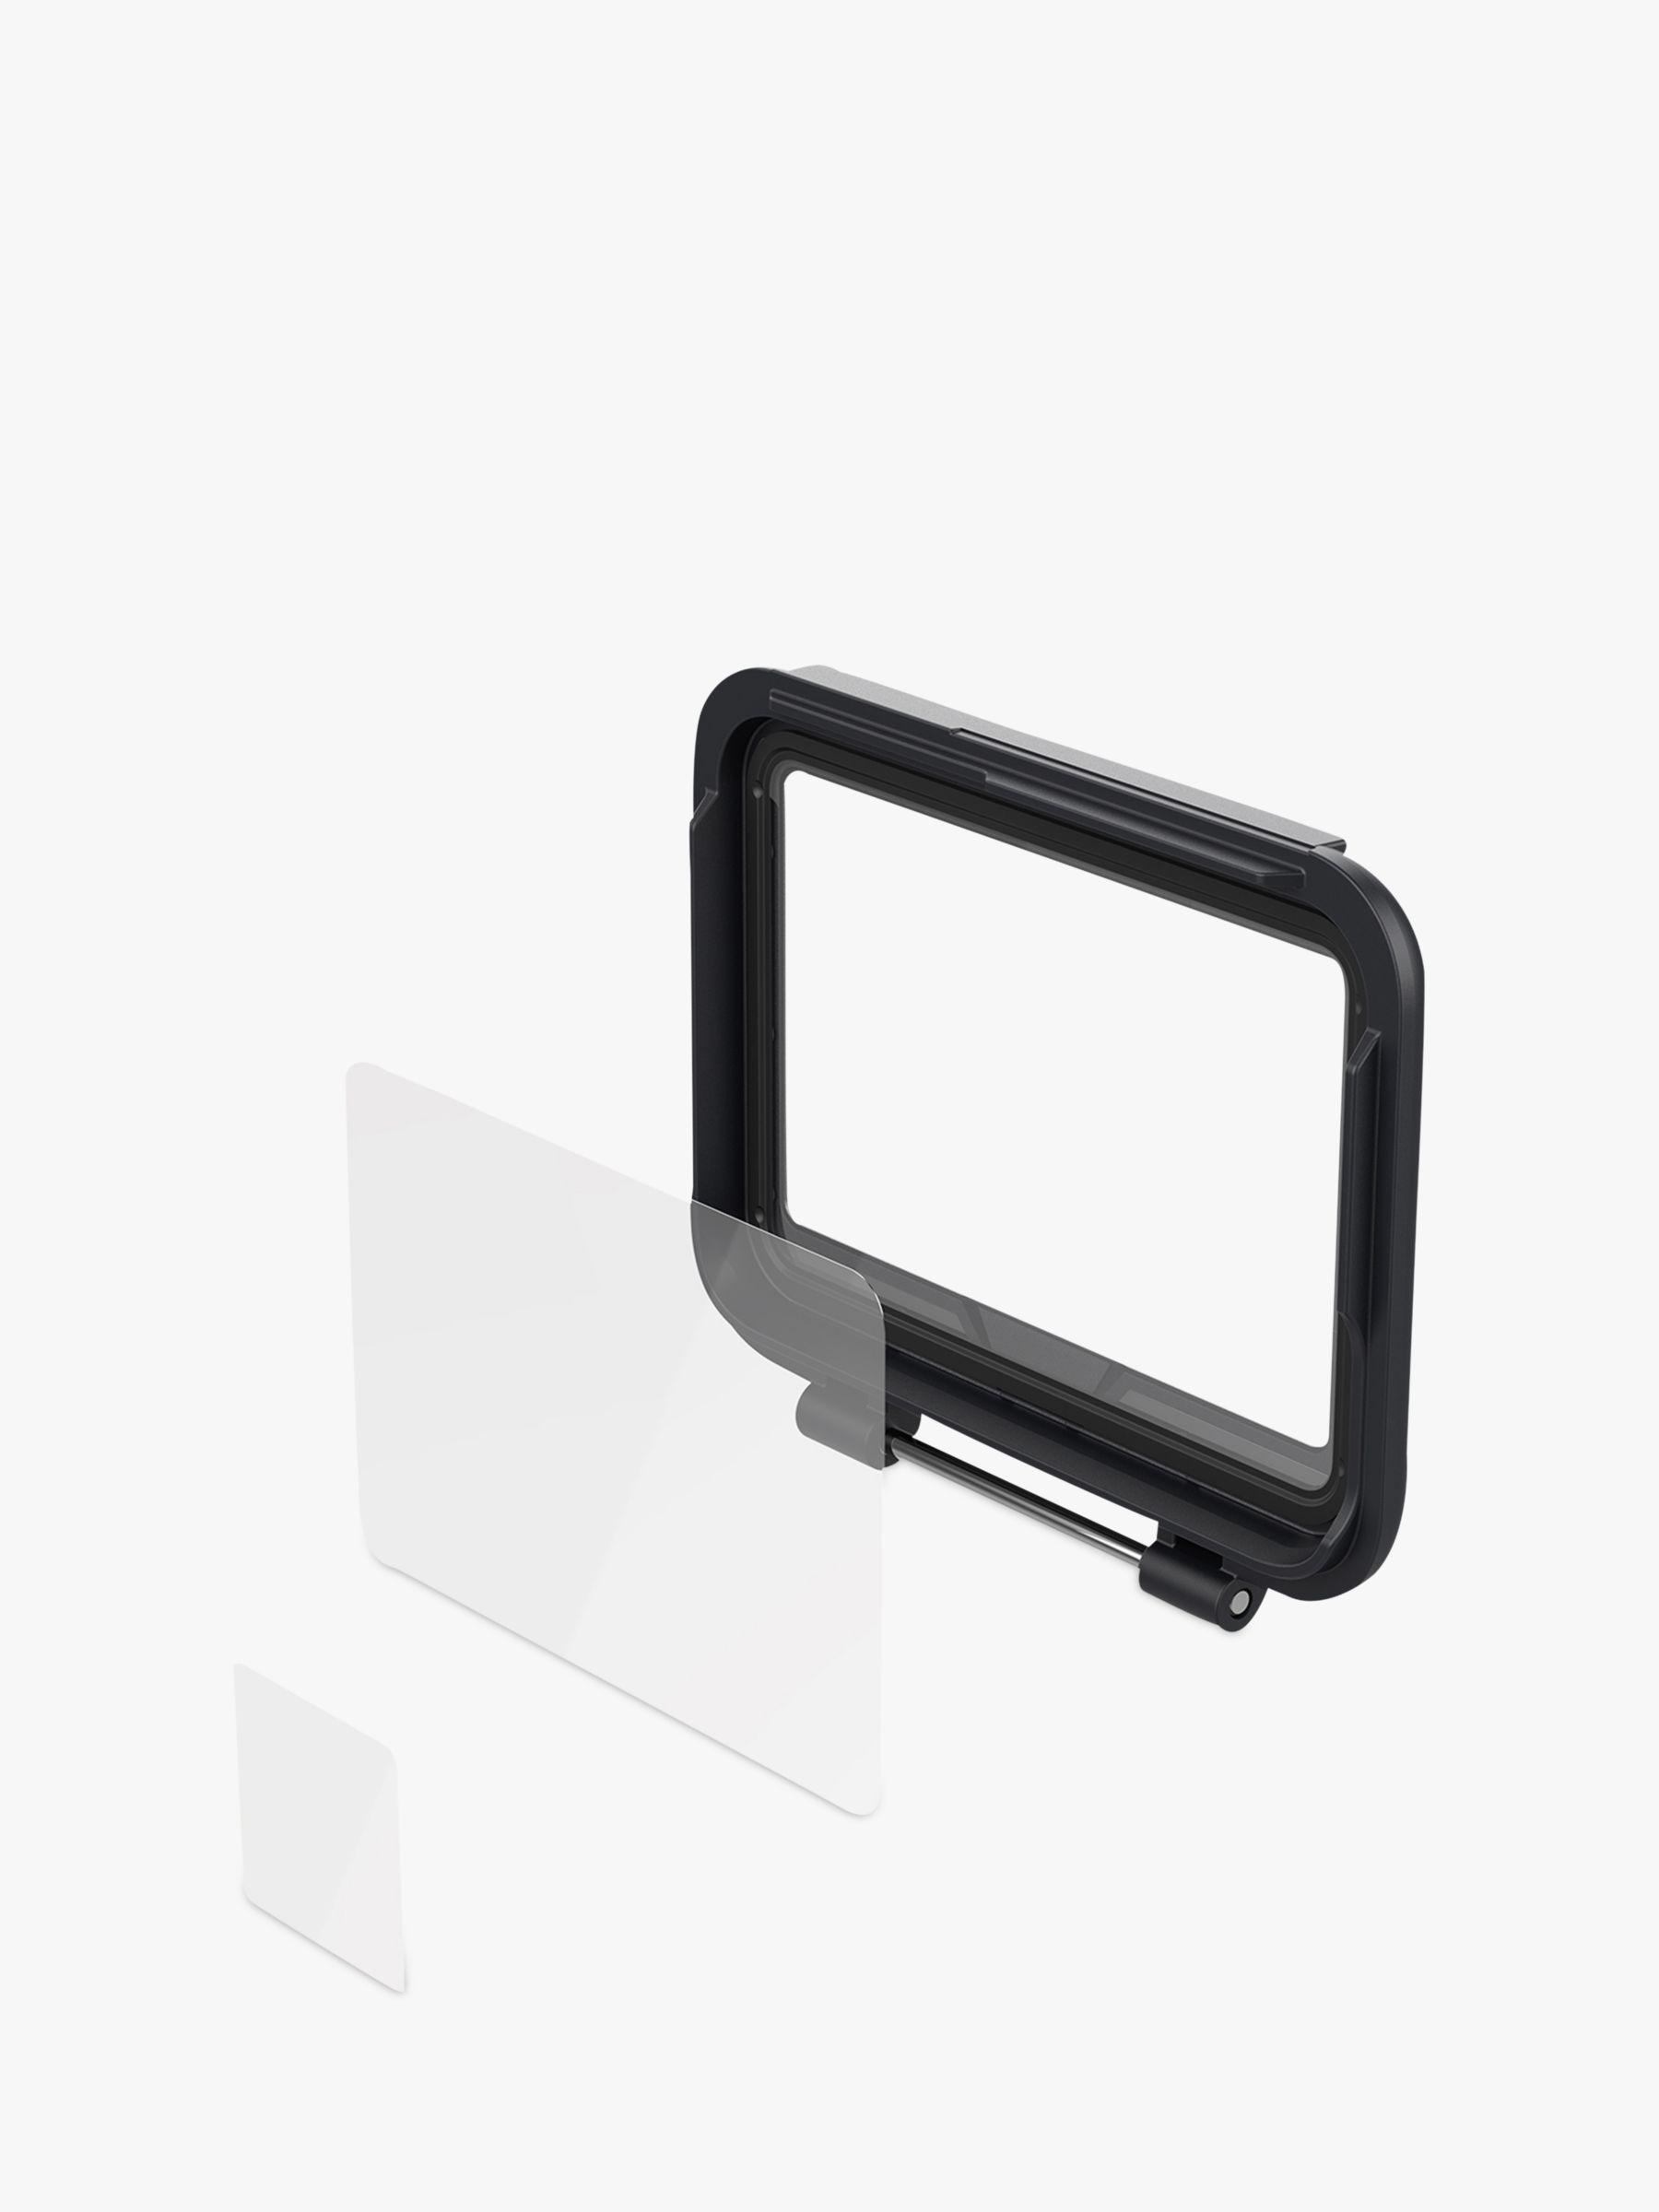 Gopro GoPro Screen Protector for HERO5 Black